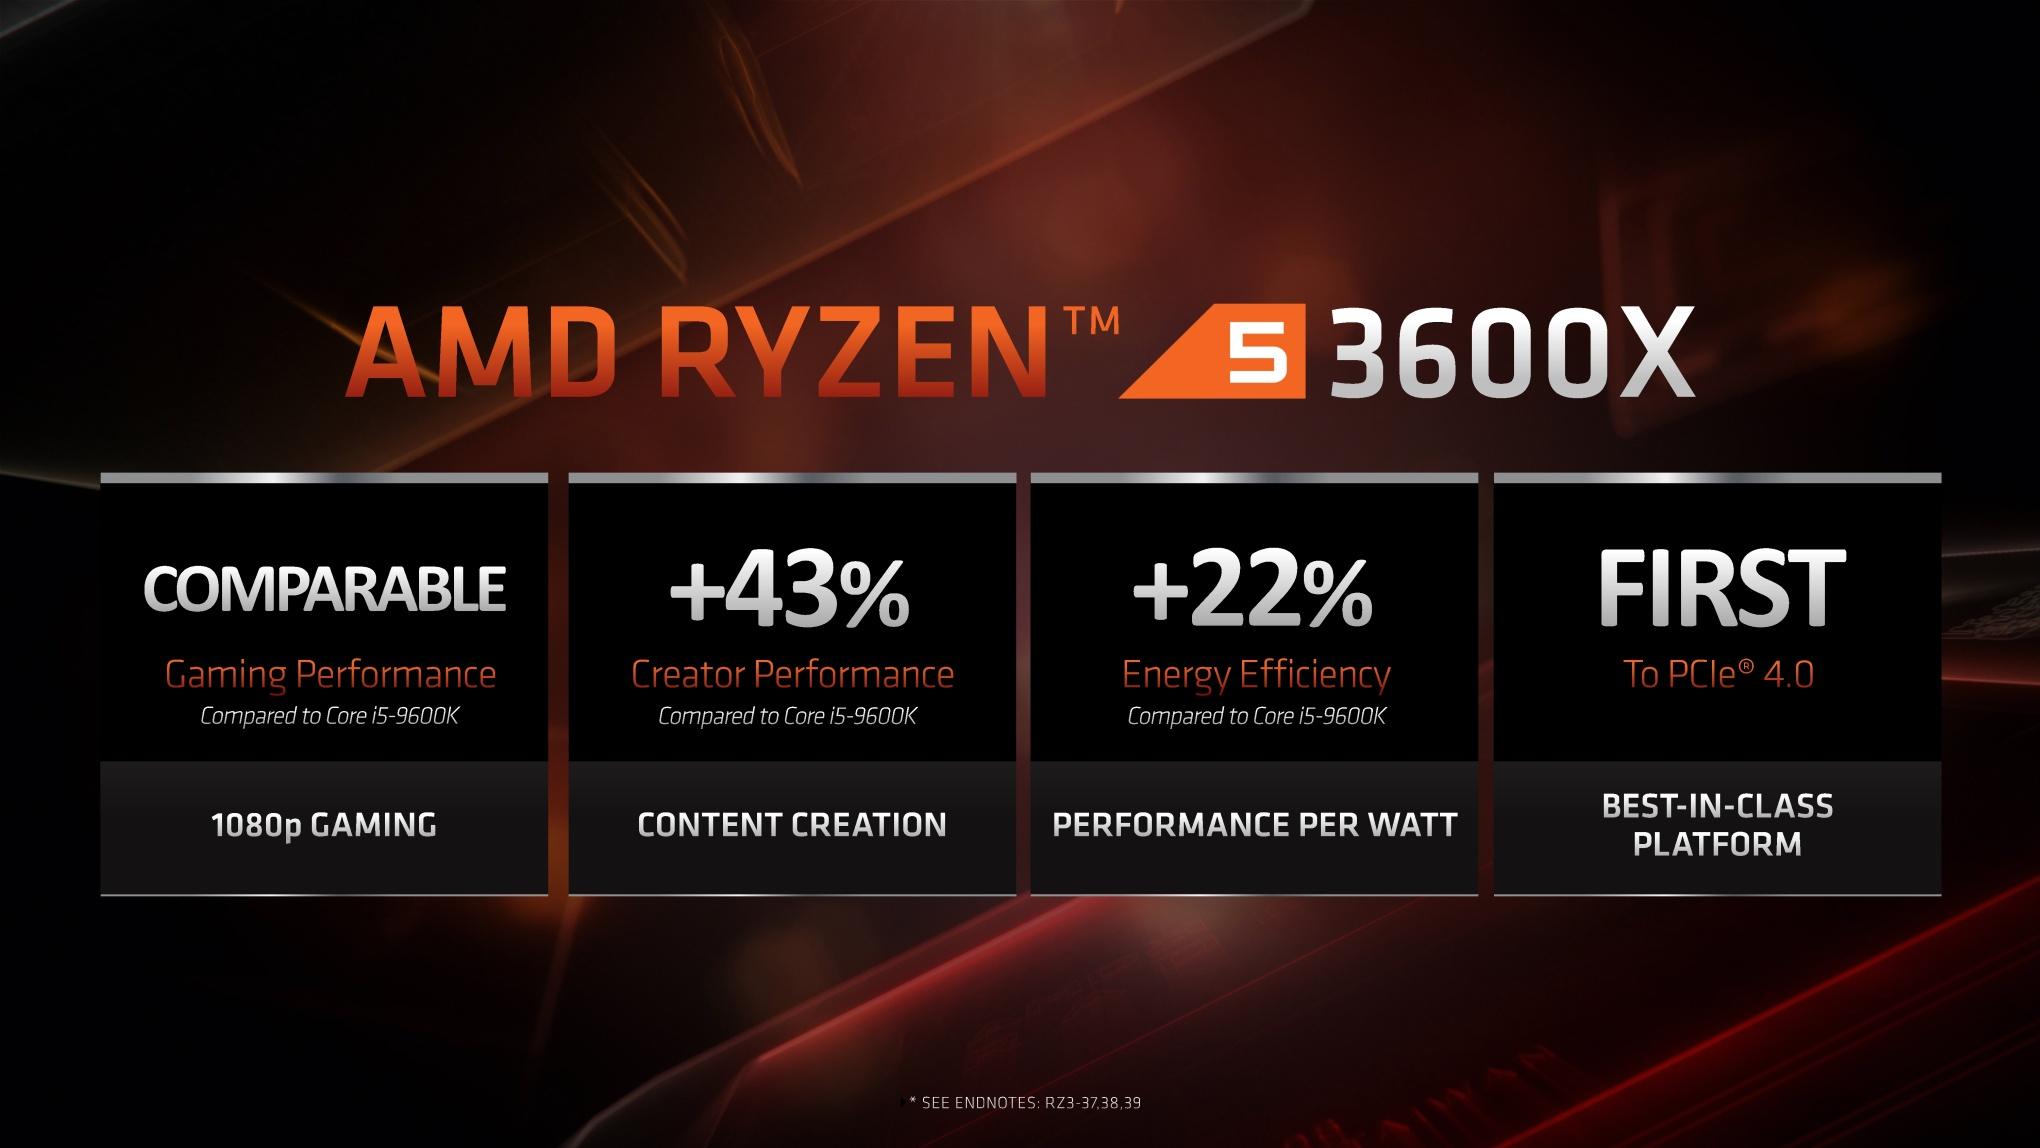 Intel Prepares 15% CPU Price Cut in Response to AMD's Ryzen